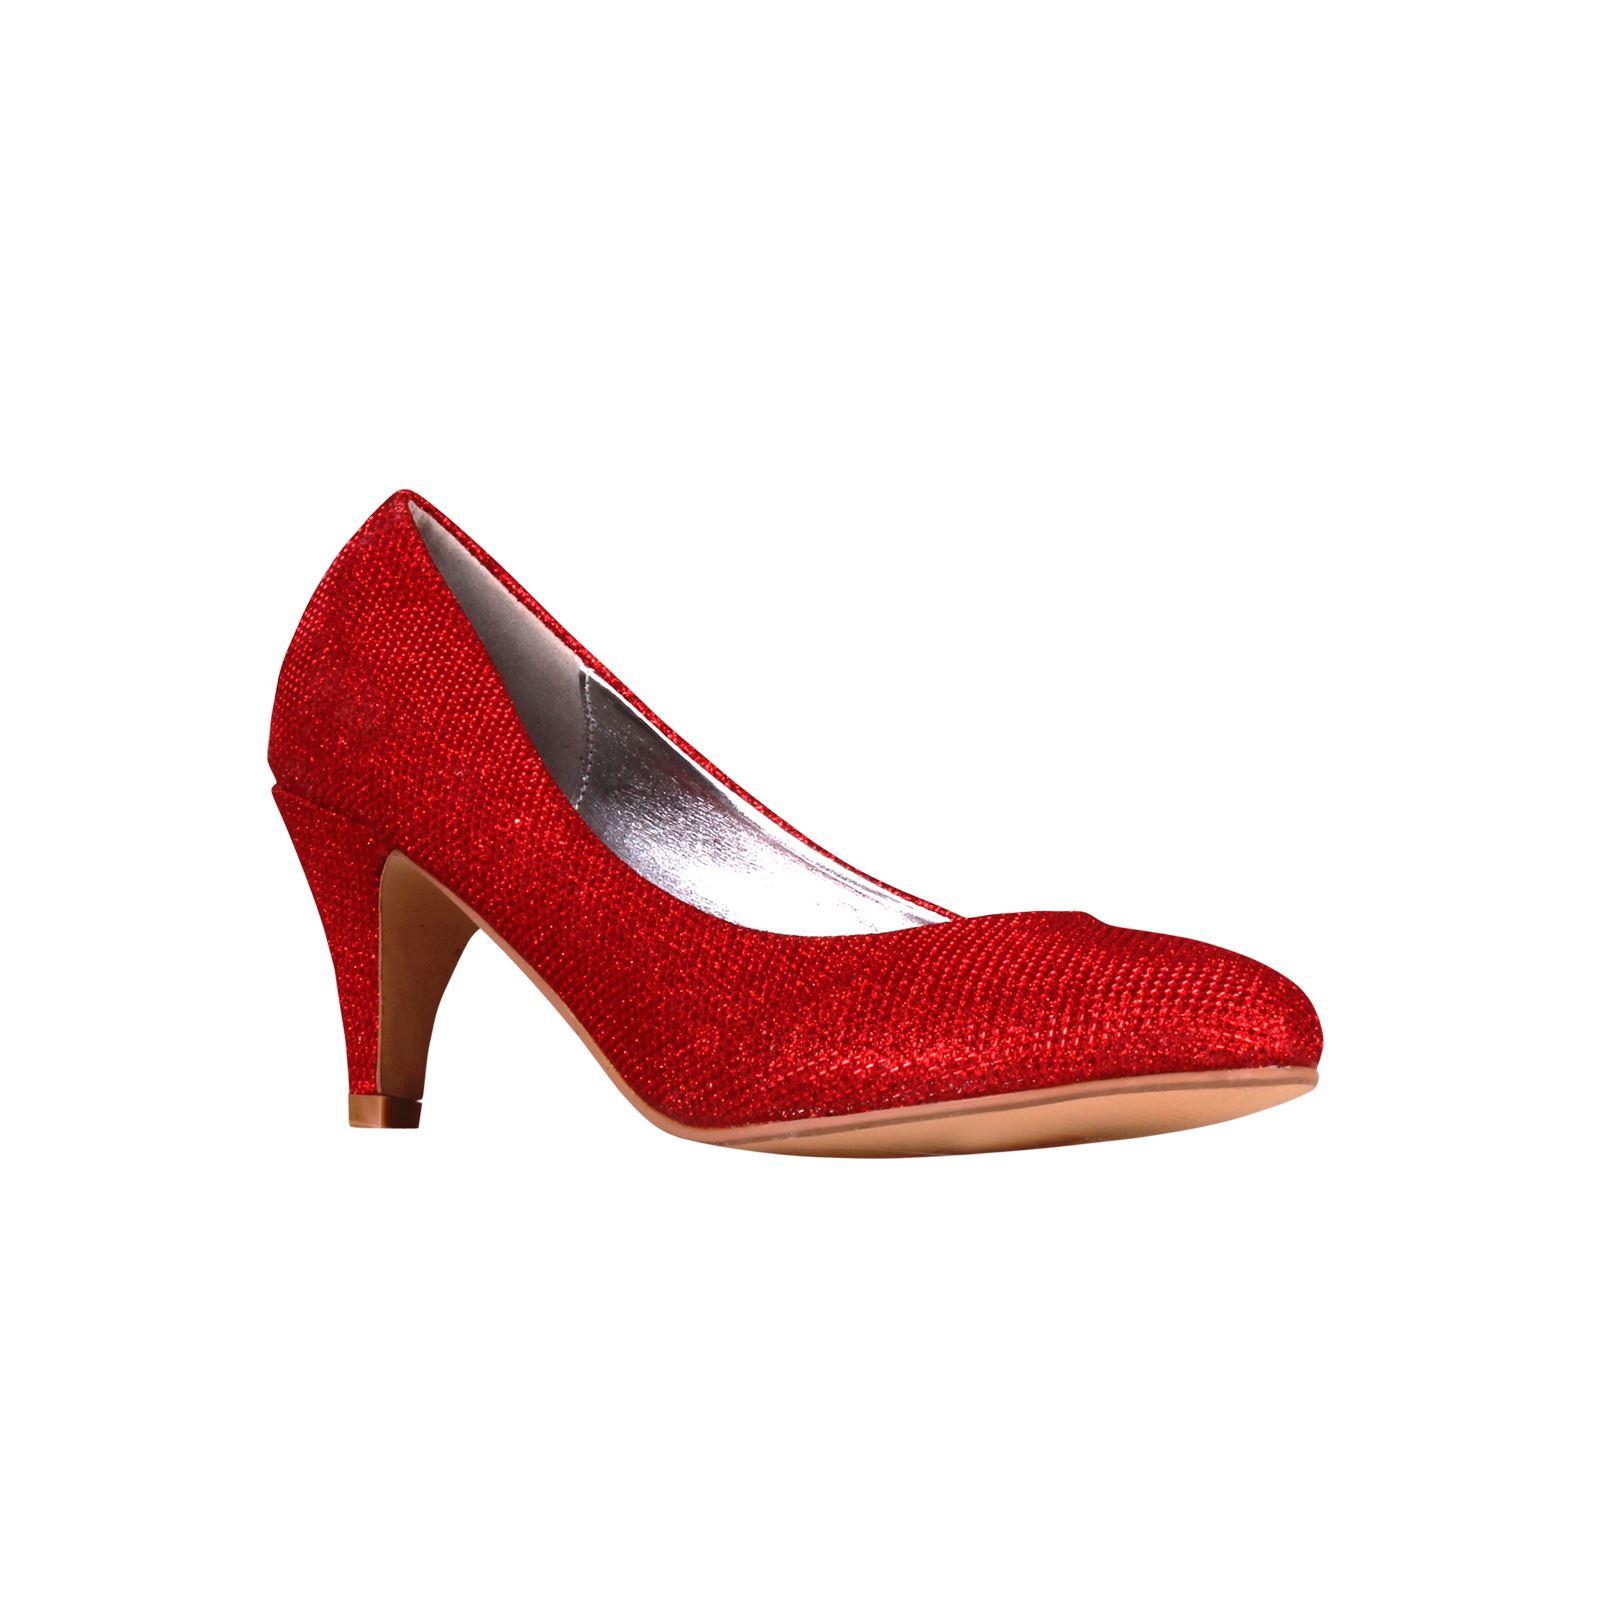 Damen Frauen Glitzer Kitten-Heel Absatz Pumps Festliche Edle Büro Party Schuhe